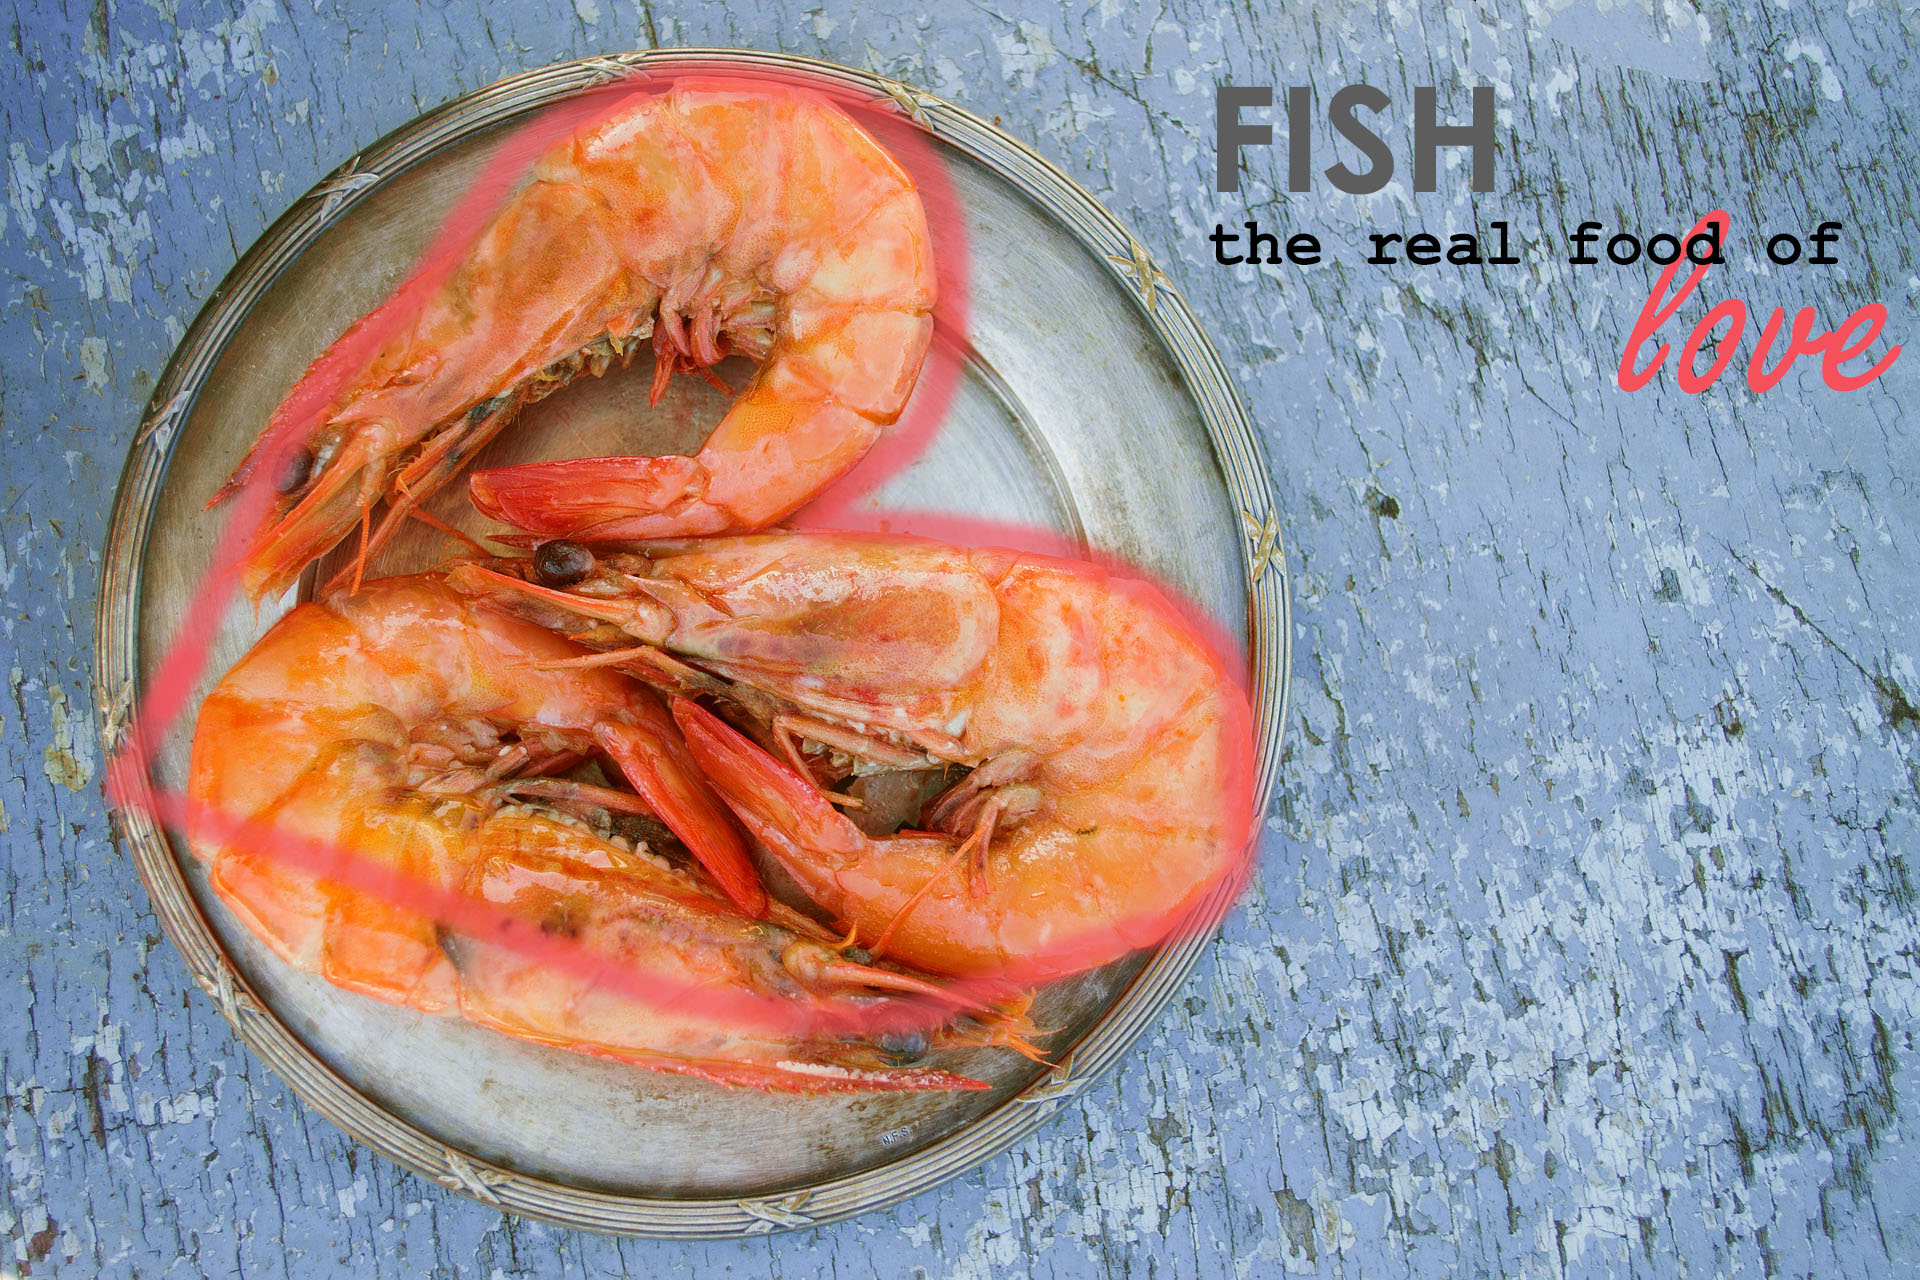 fisheries Feb blog image.jpg